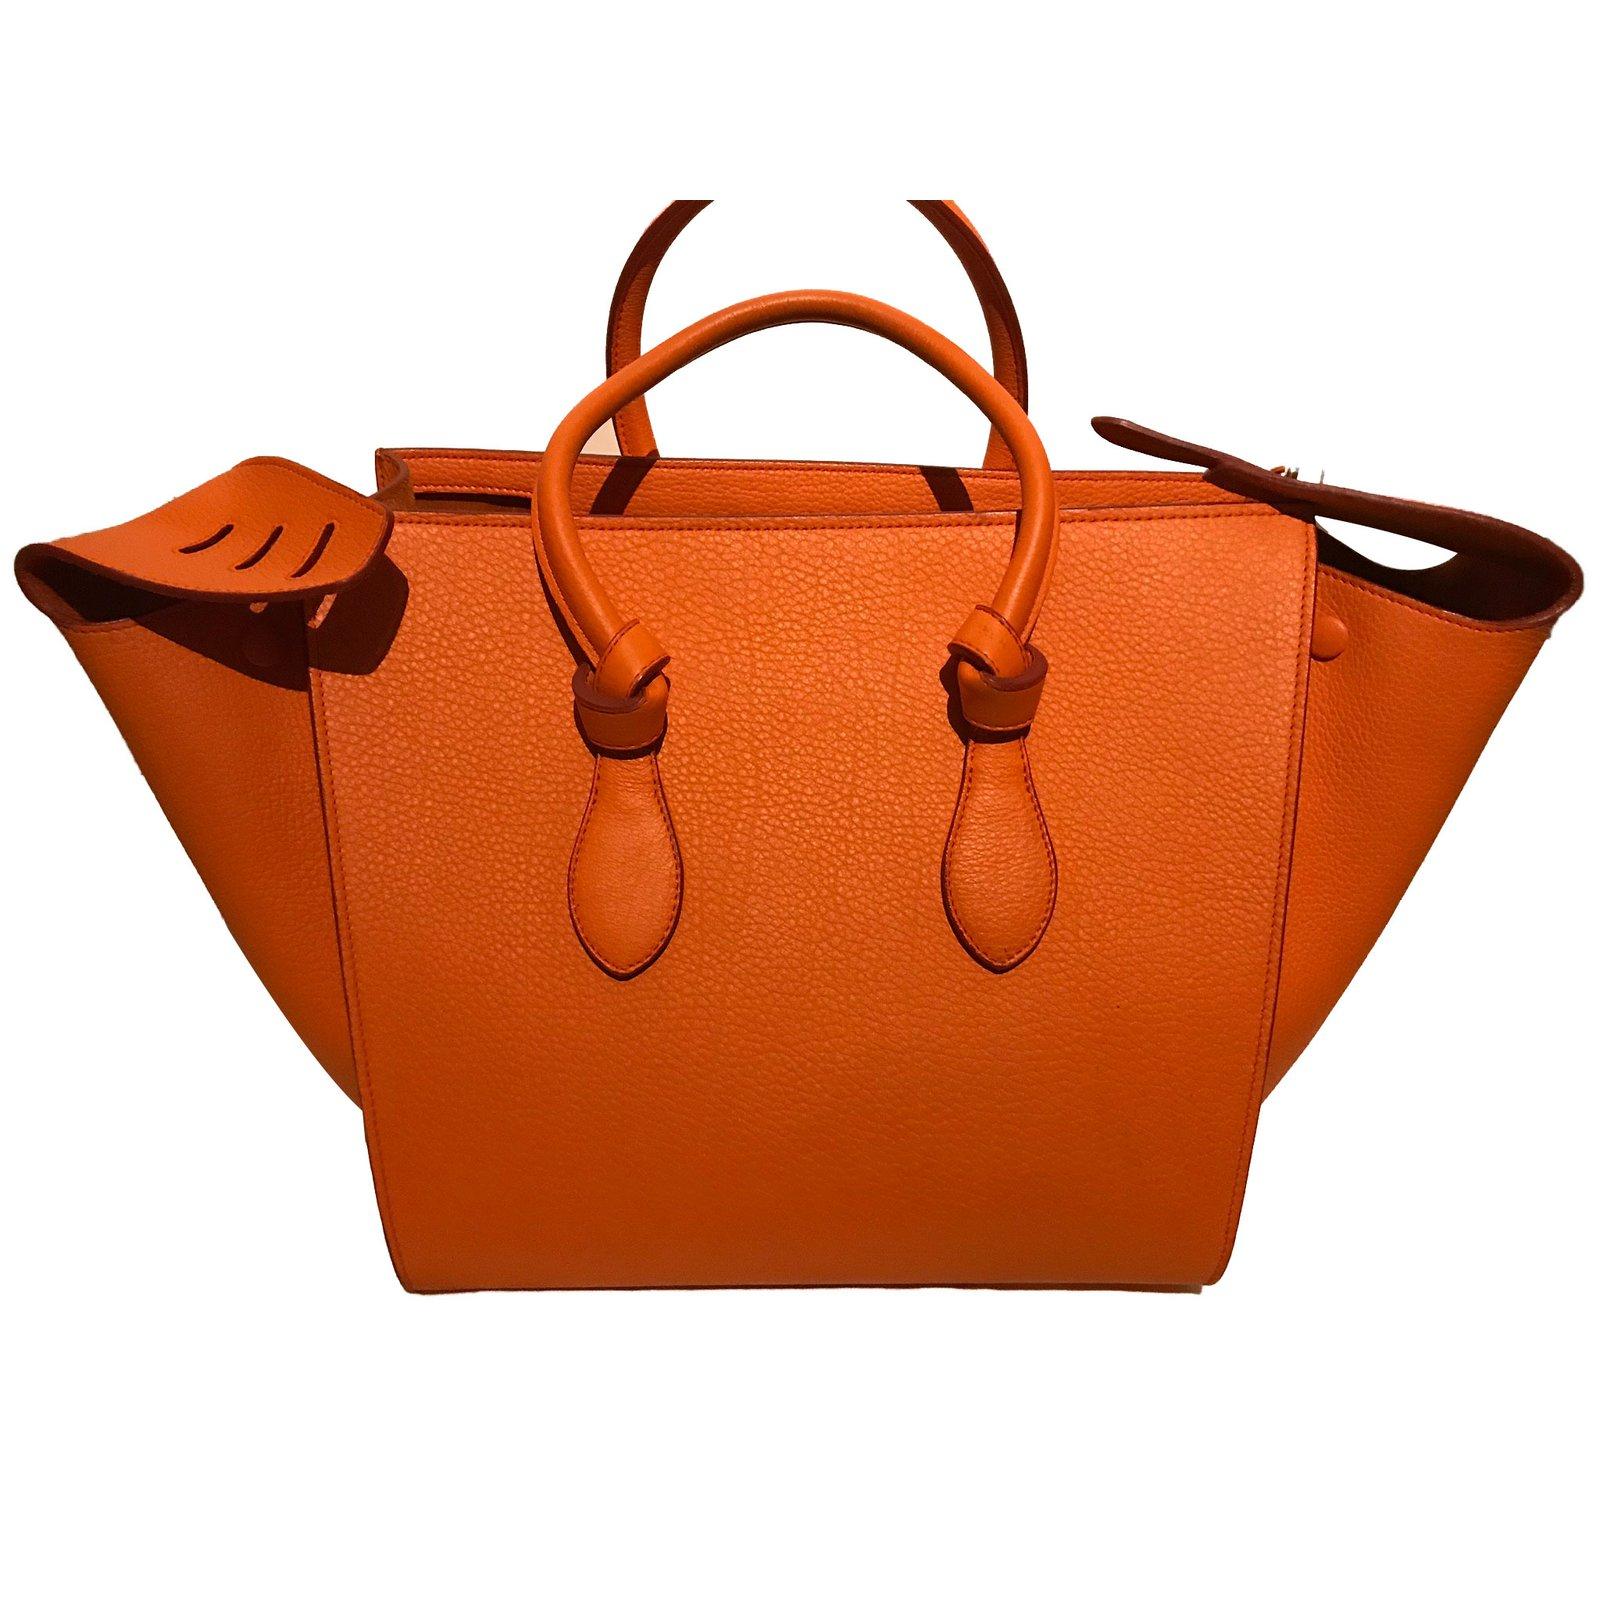 659f90f402 Céline À Tie Main Sac Joli Closet Cuir Orange 66679 Sacs Ref nO0w8vmN